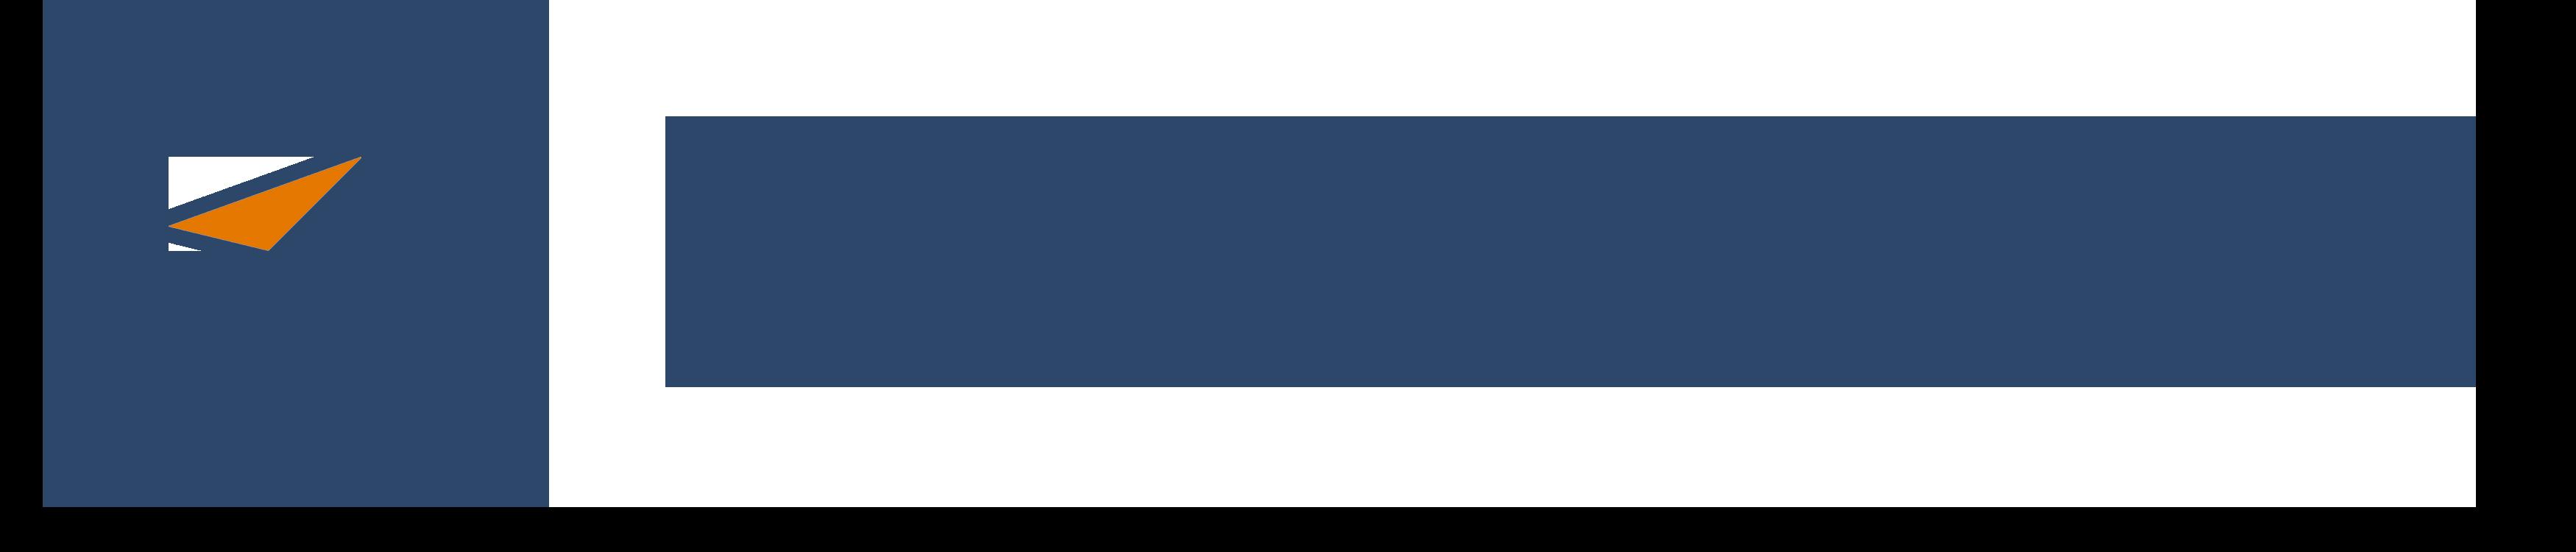 Navigate Startup Incubator